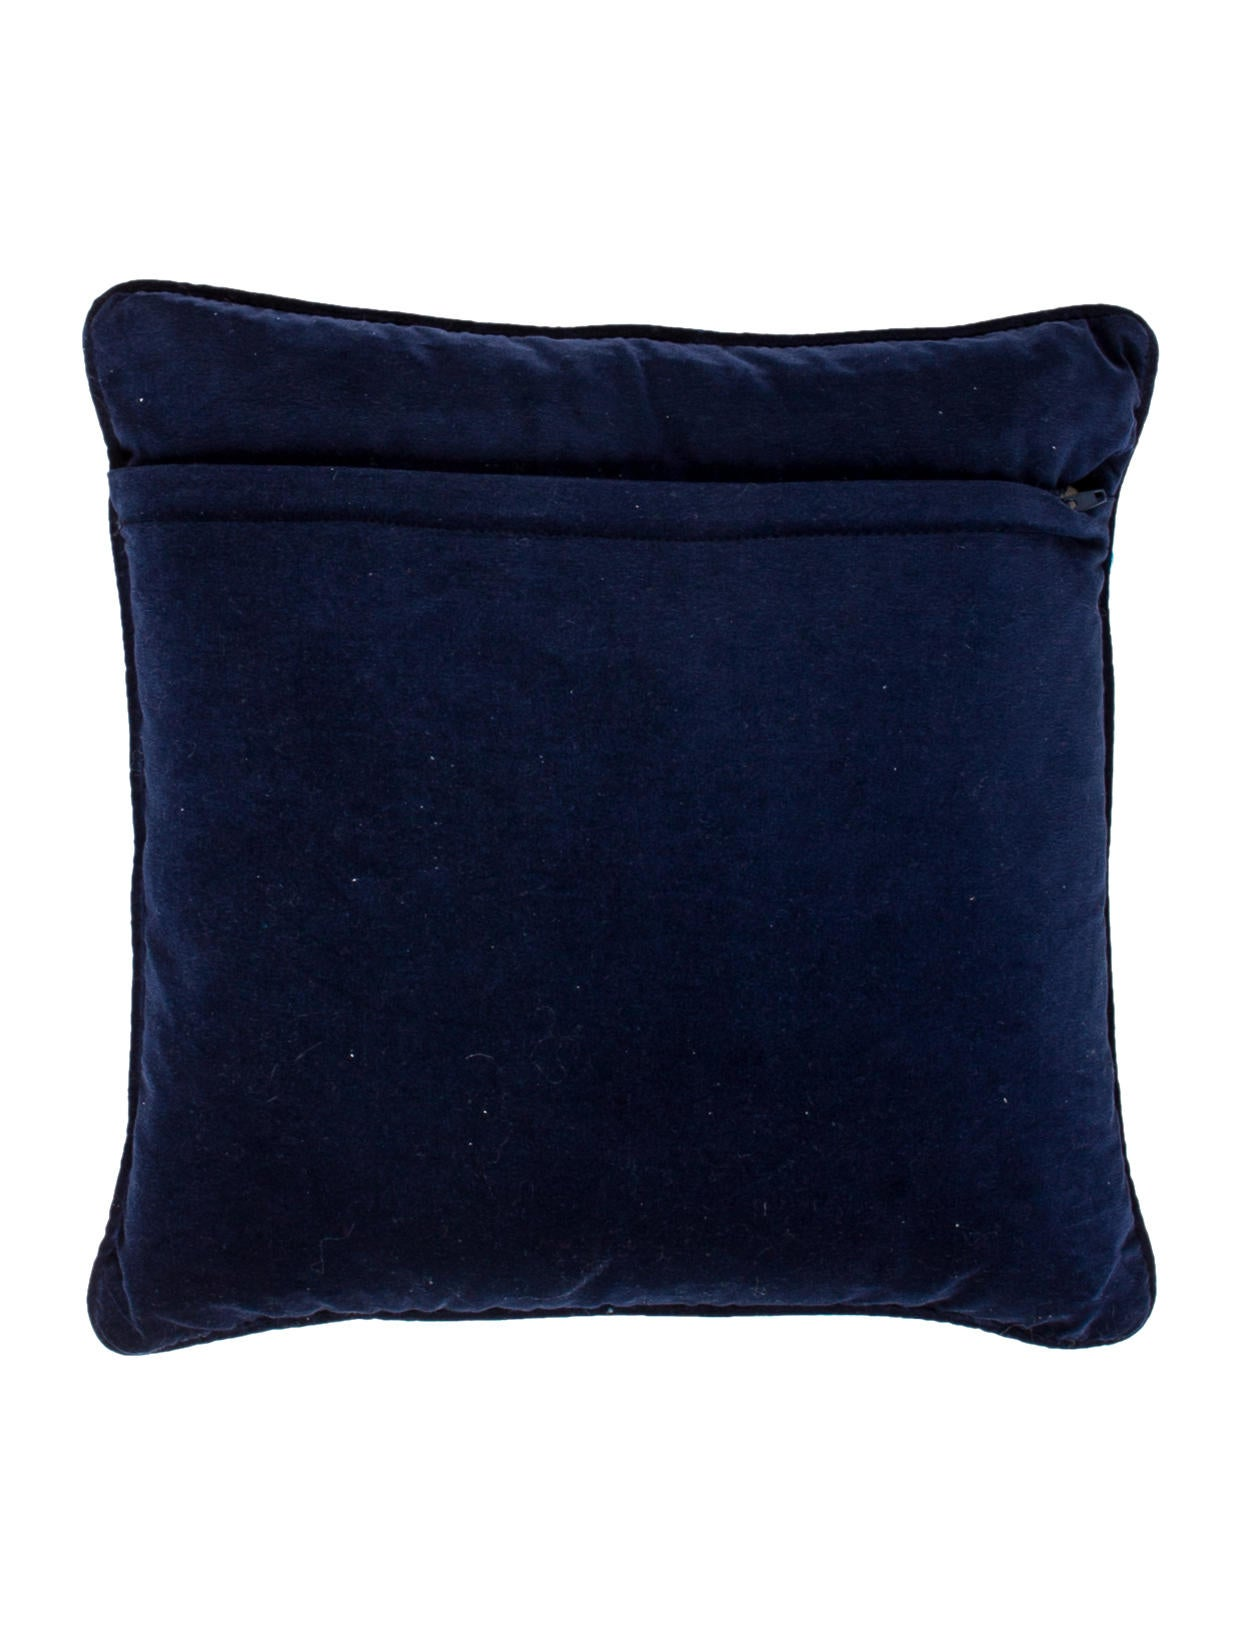 Pillow And Throw : Jonathan Adler Embroidered Wool Throw Pillow - Pillows And Throws - JTADL20434 The RealReal